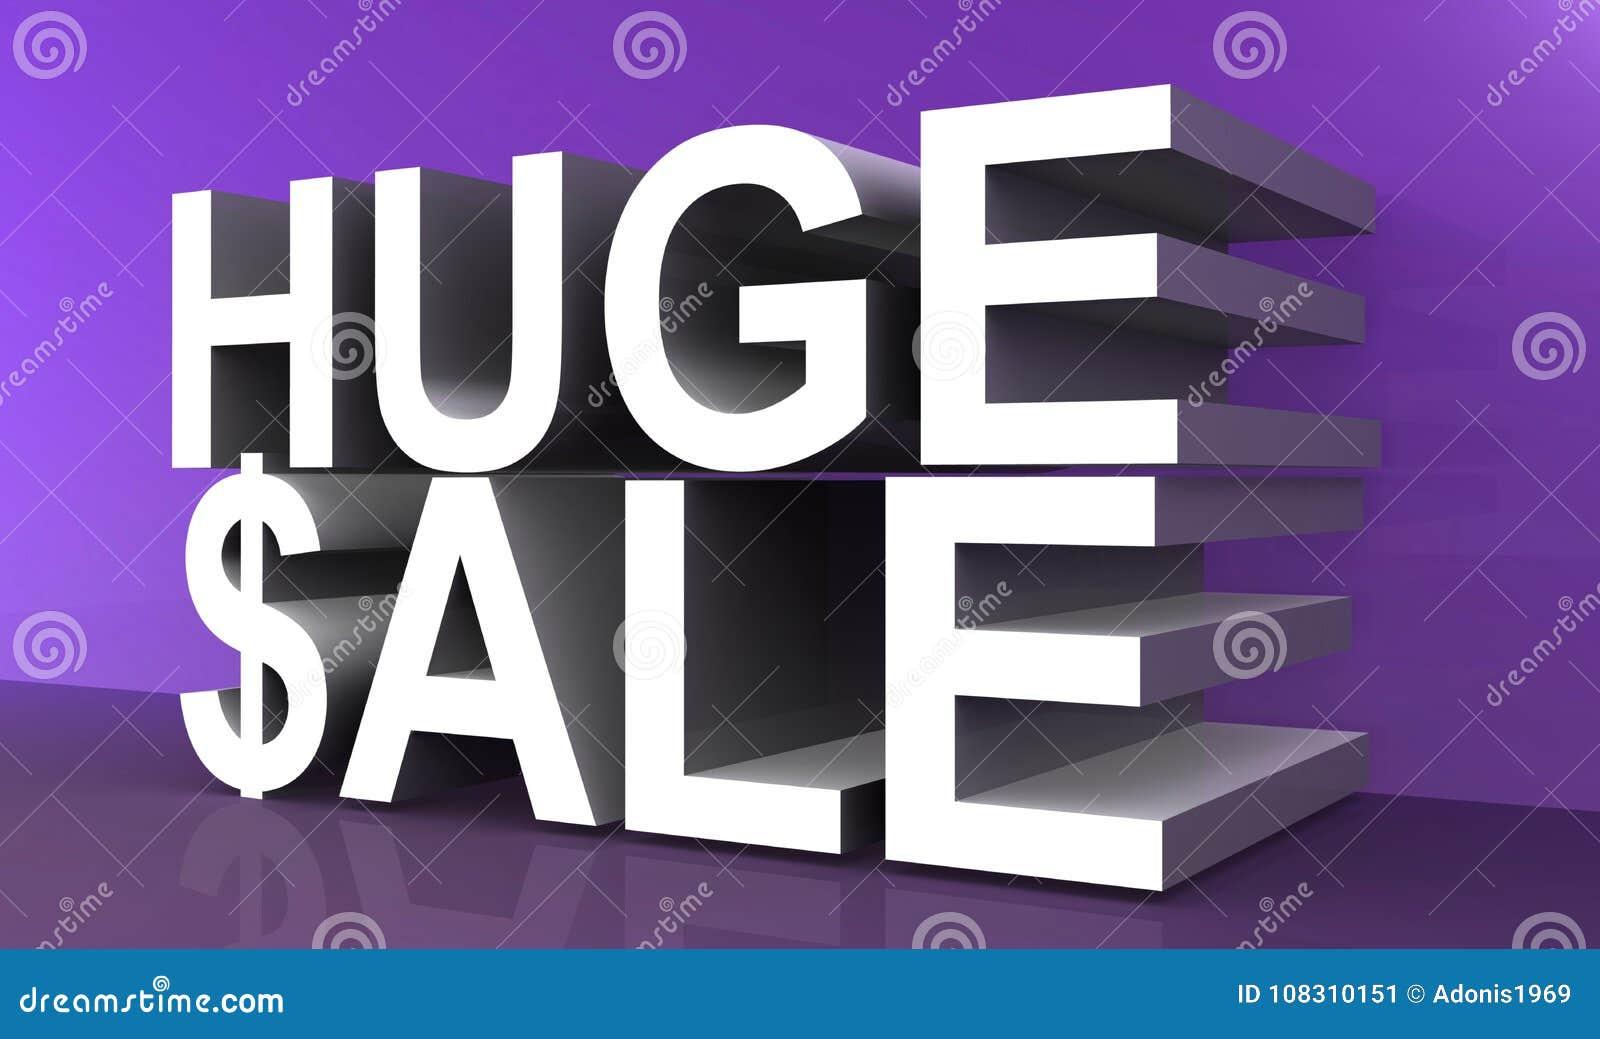 Huge sale text